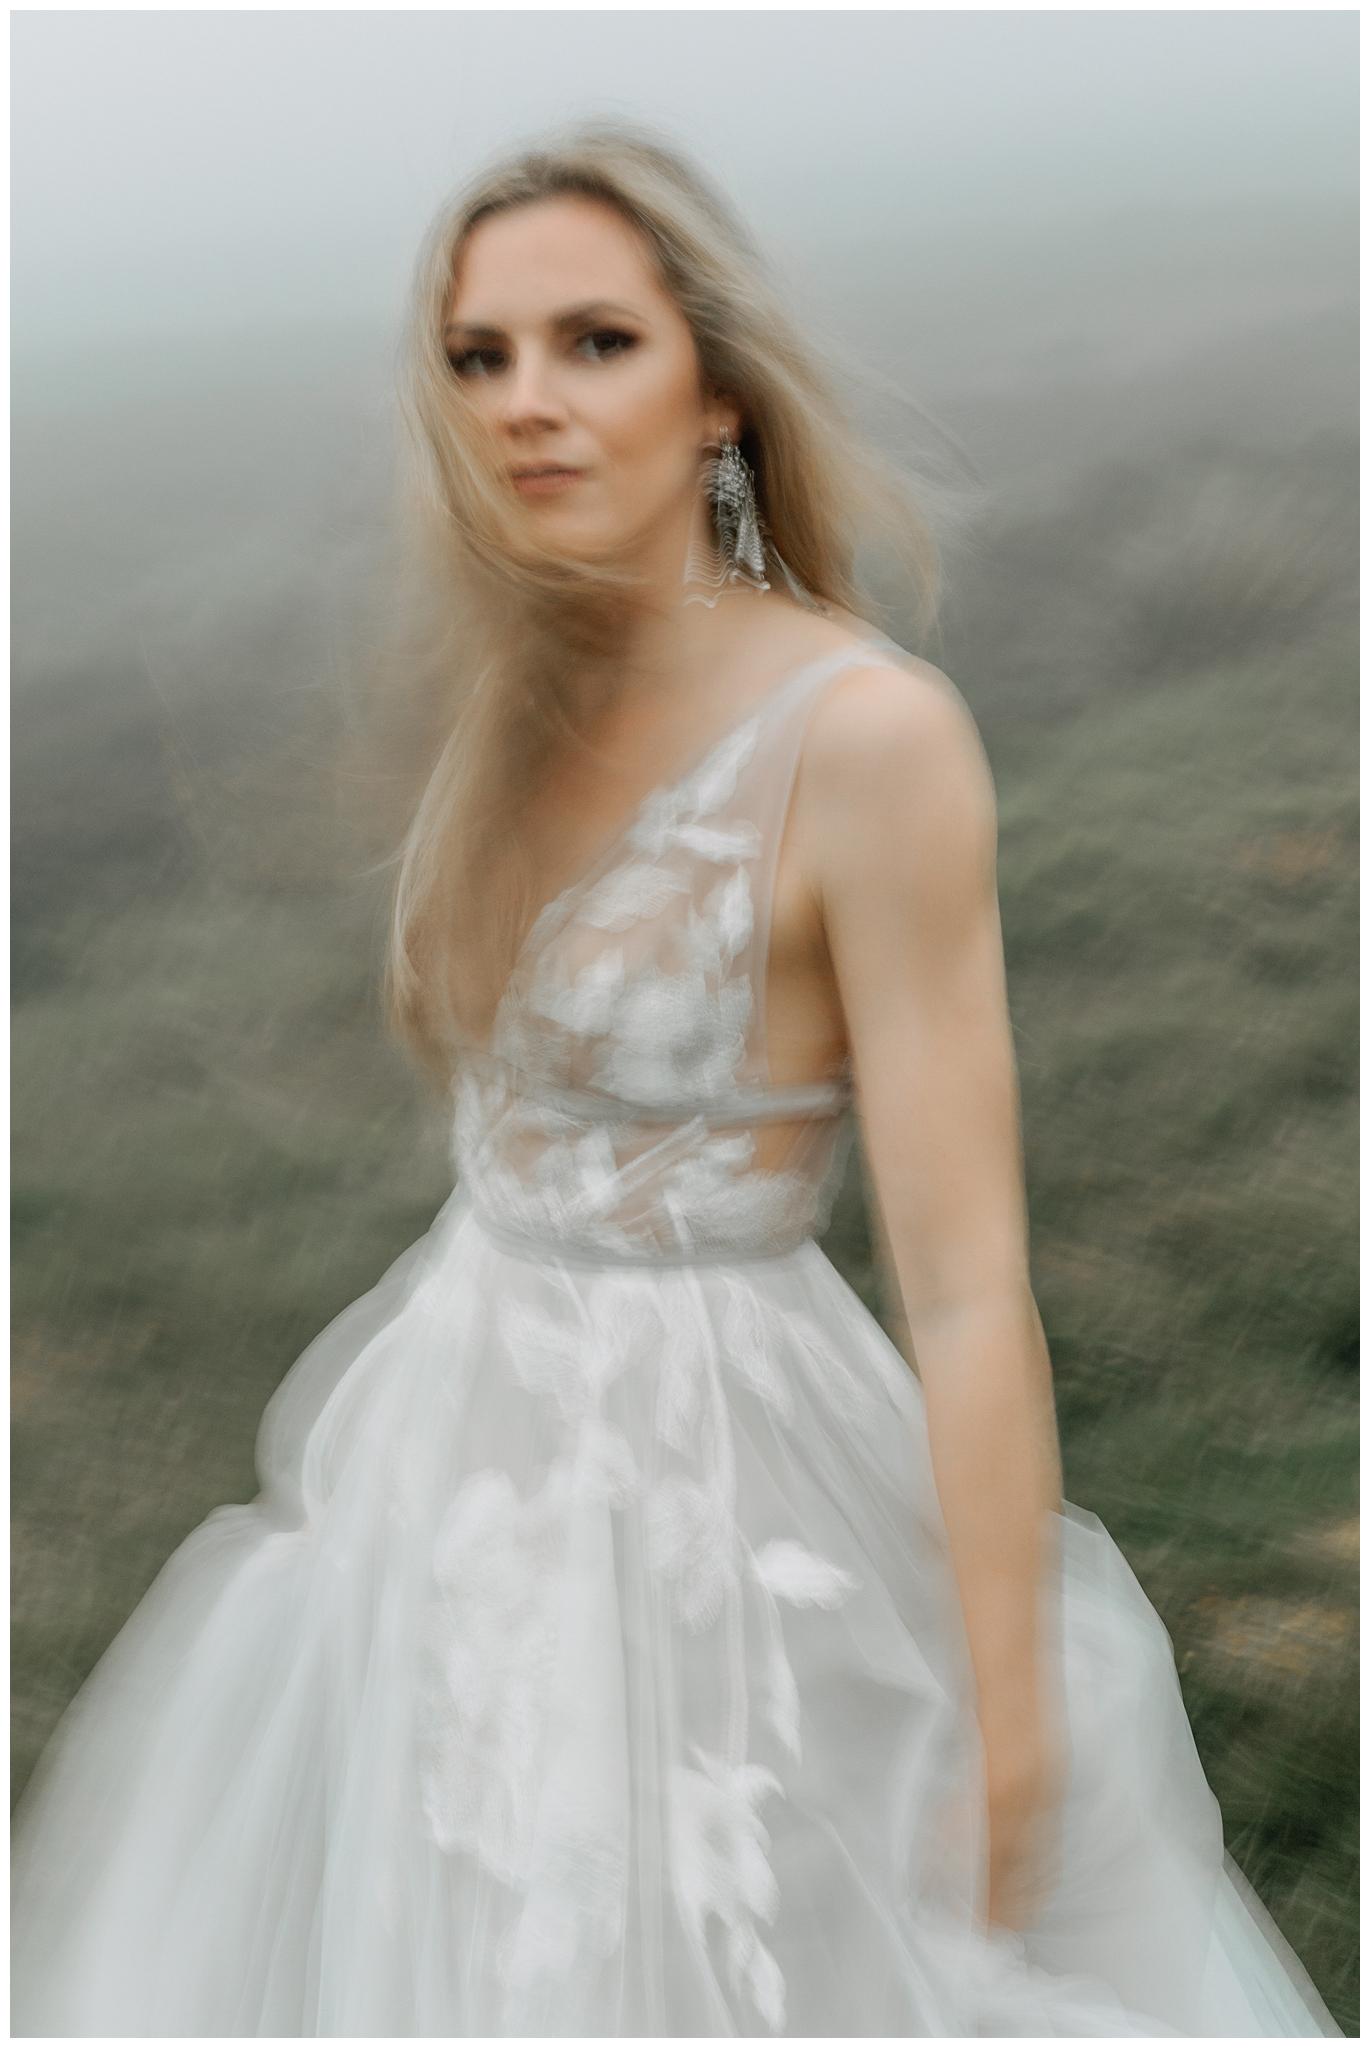 austin-texas-scottish-wedding-bride-groom22019.JPG